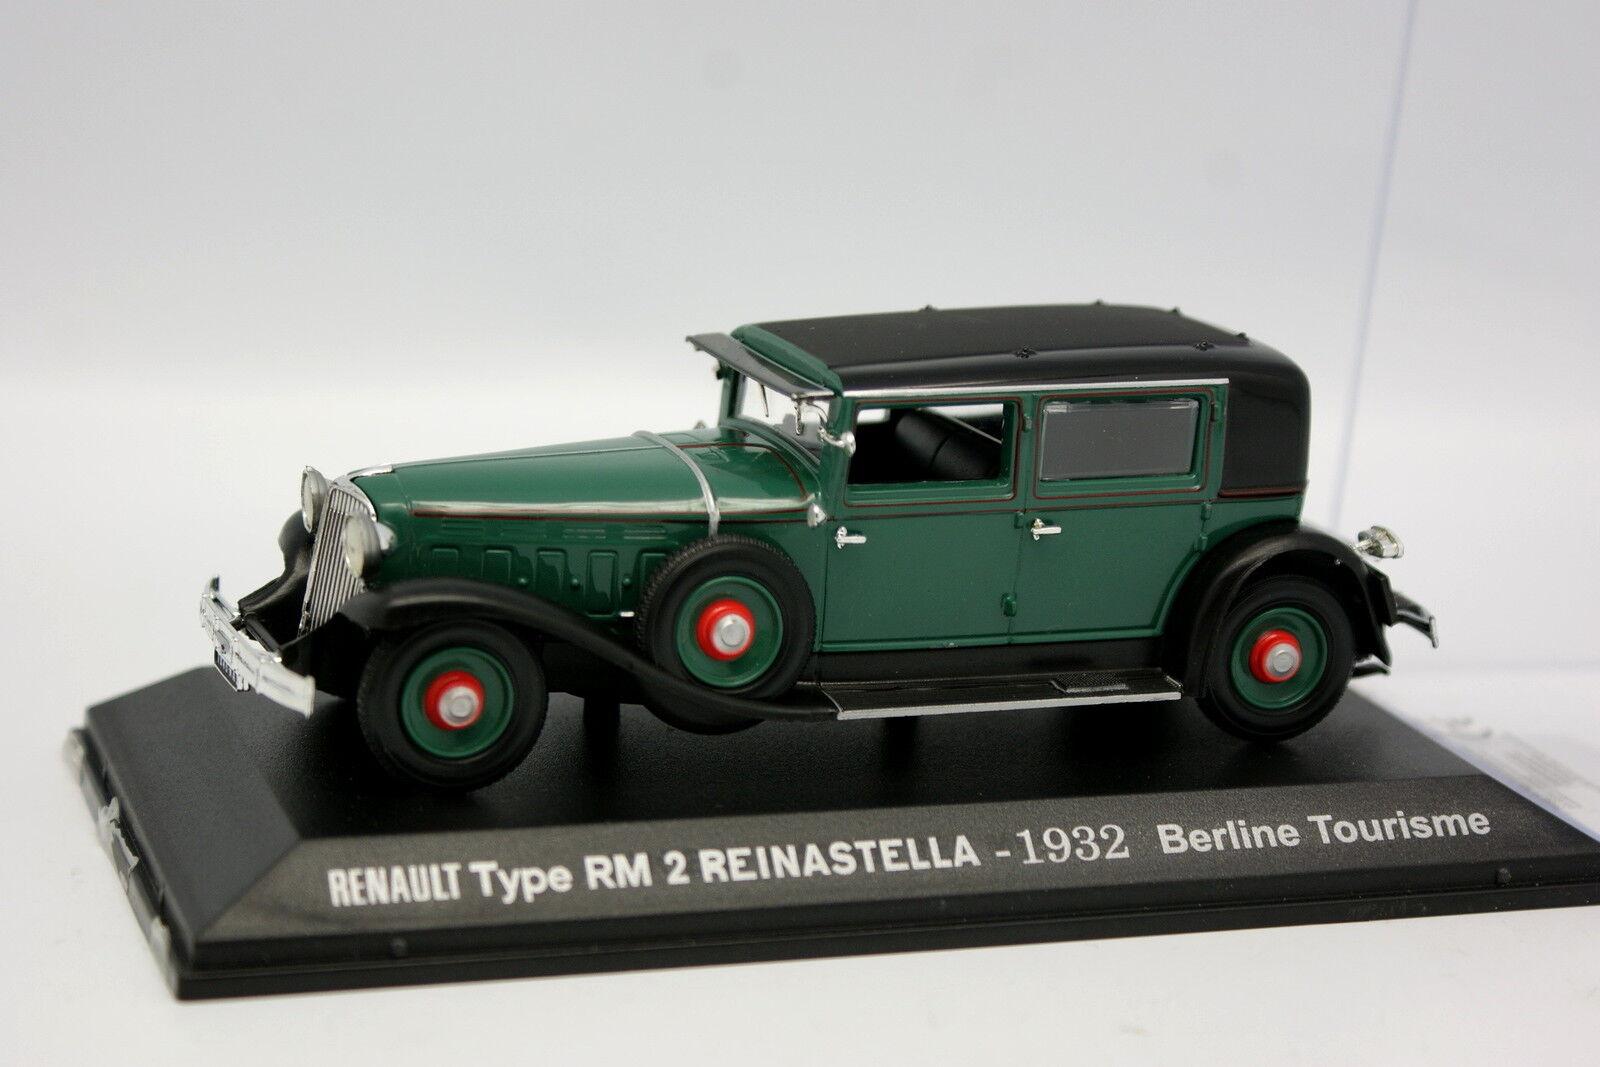 Norev Press 1 43 - Renault RM2 RM2 RM2 Reinastella 1932 Green f1318c